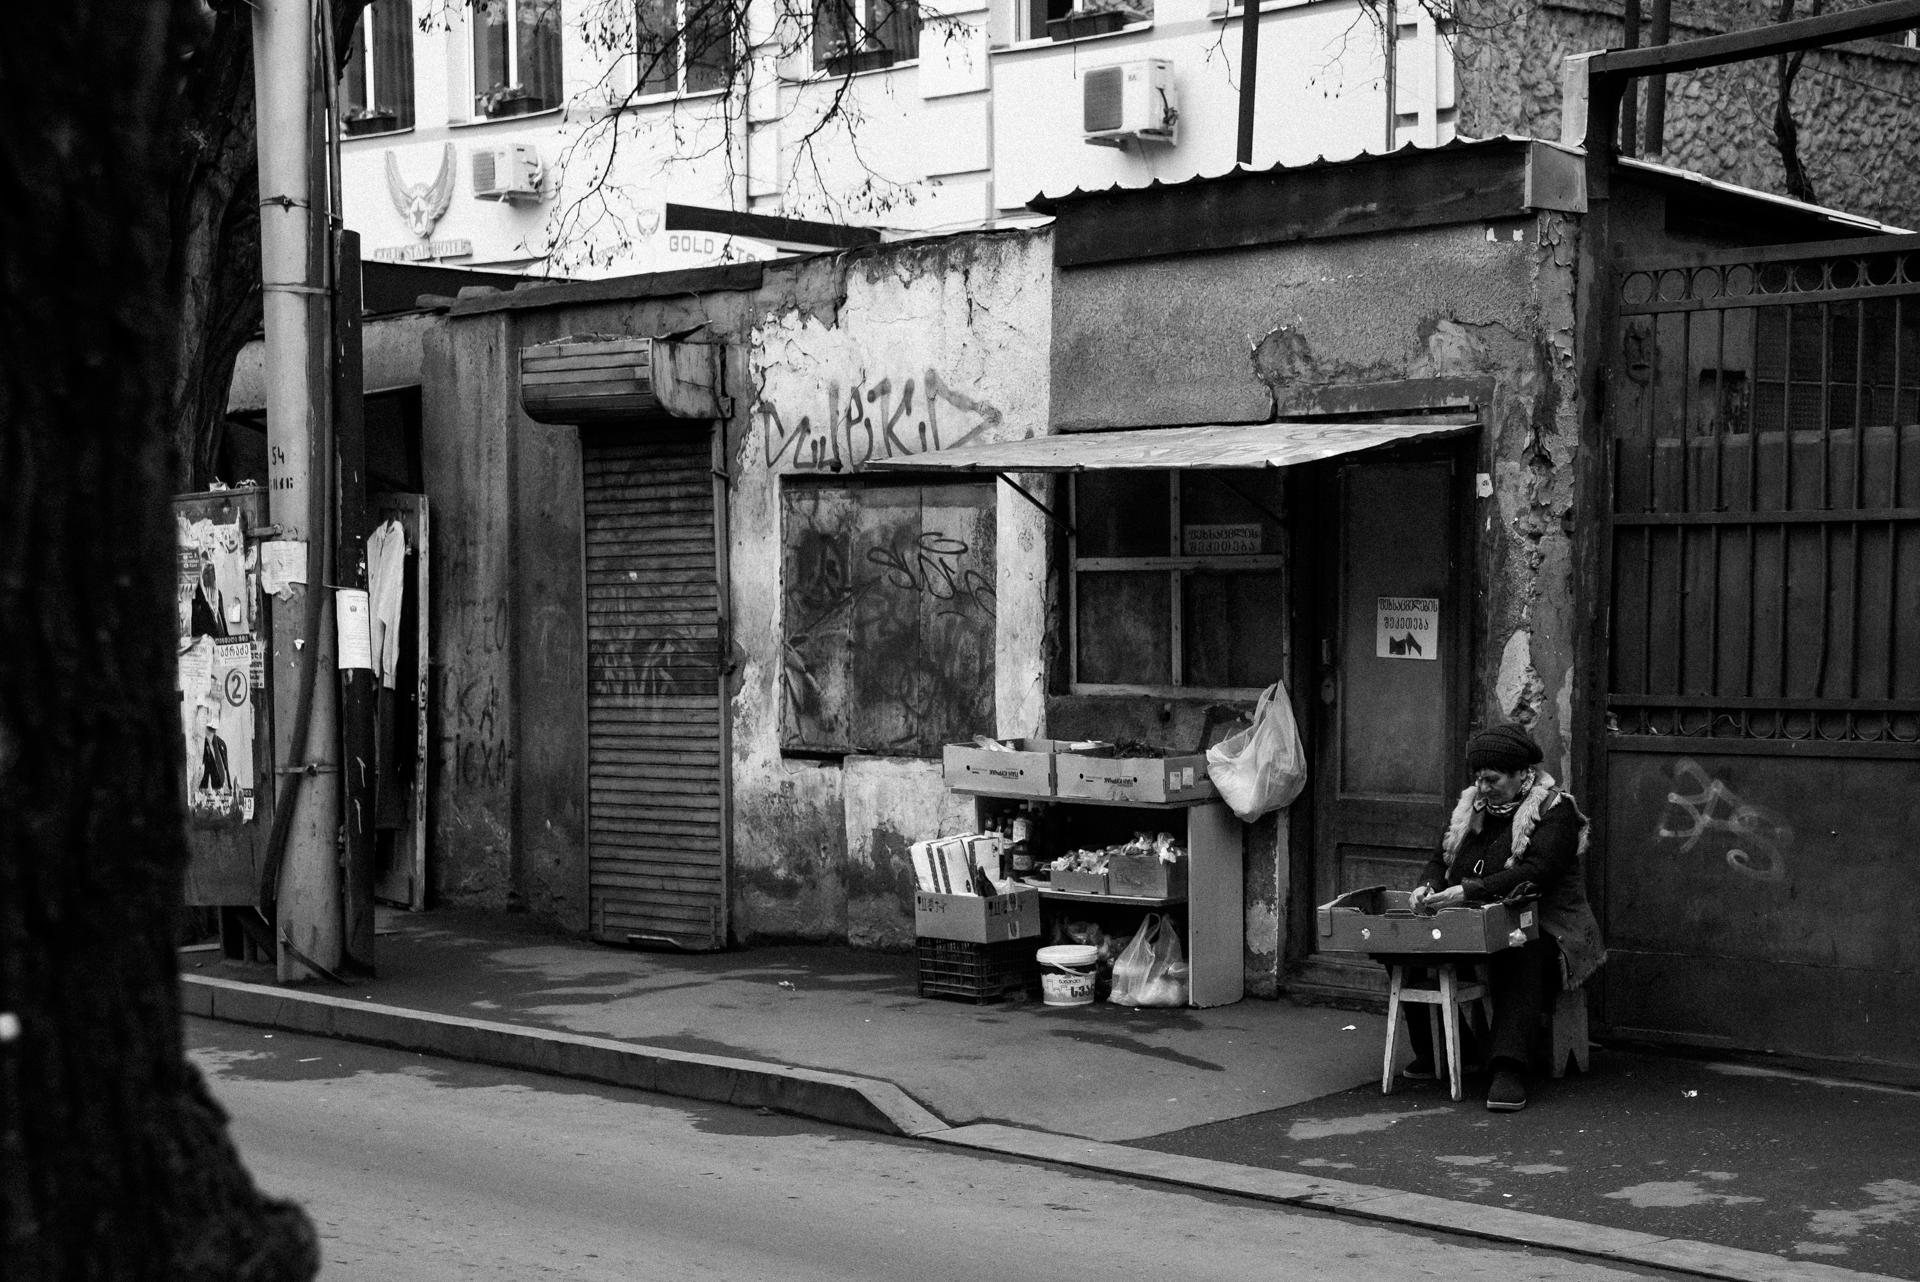 tbilisi-georgia-black-and-white-photography (13).jpg